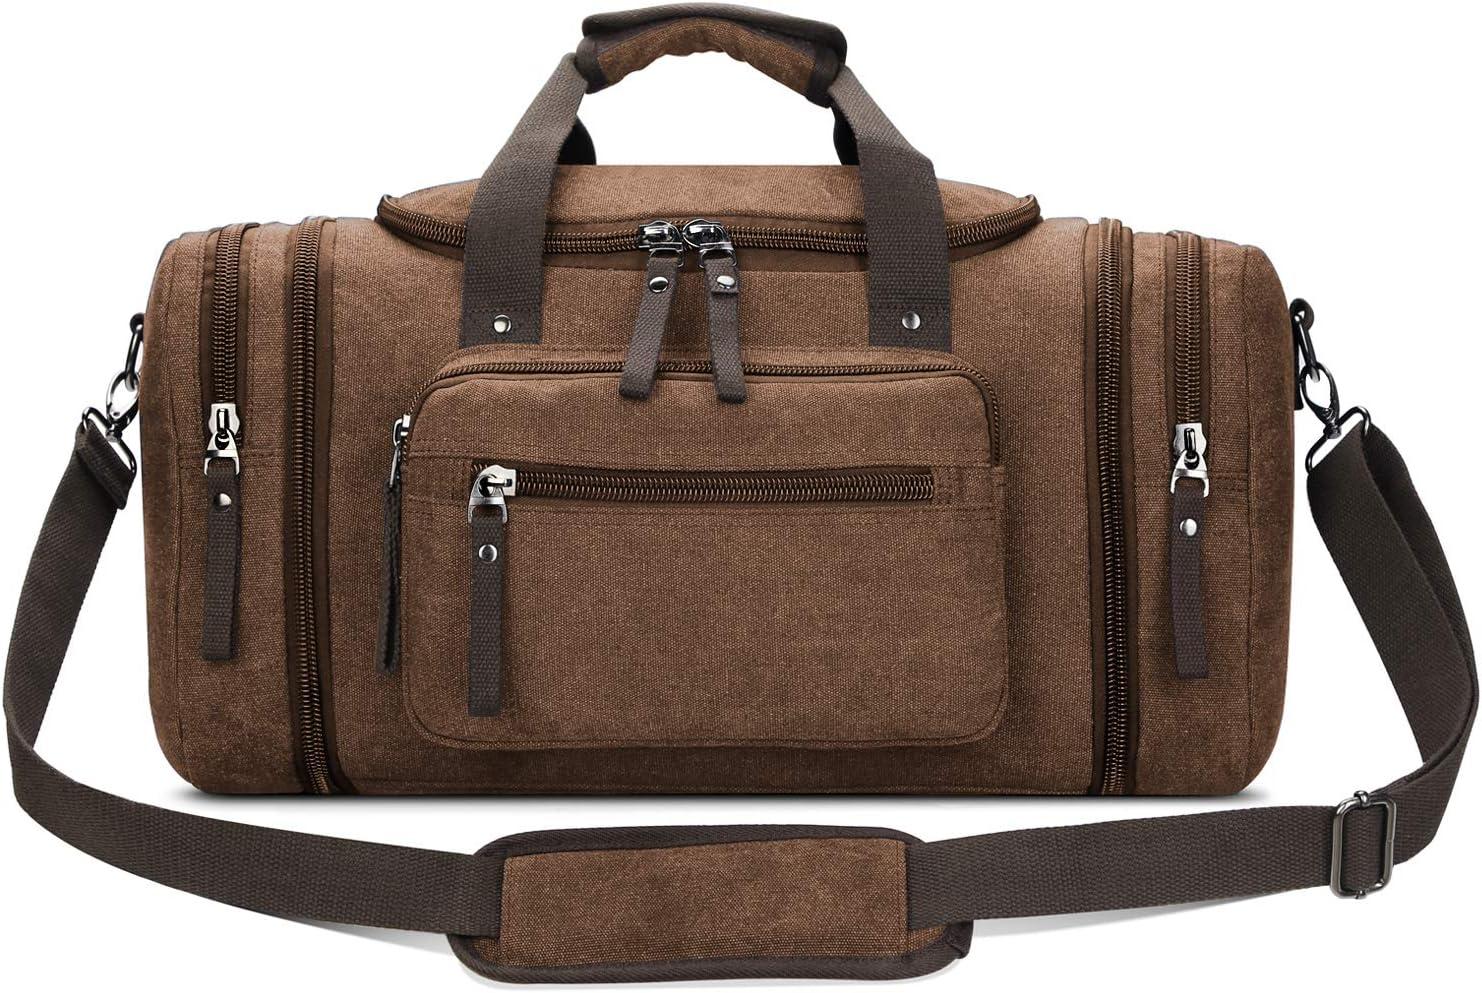 Toupons Canvas Travel Duffel Bag Men's Weekender Overnight Bag (Coffee)